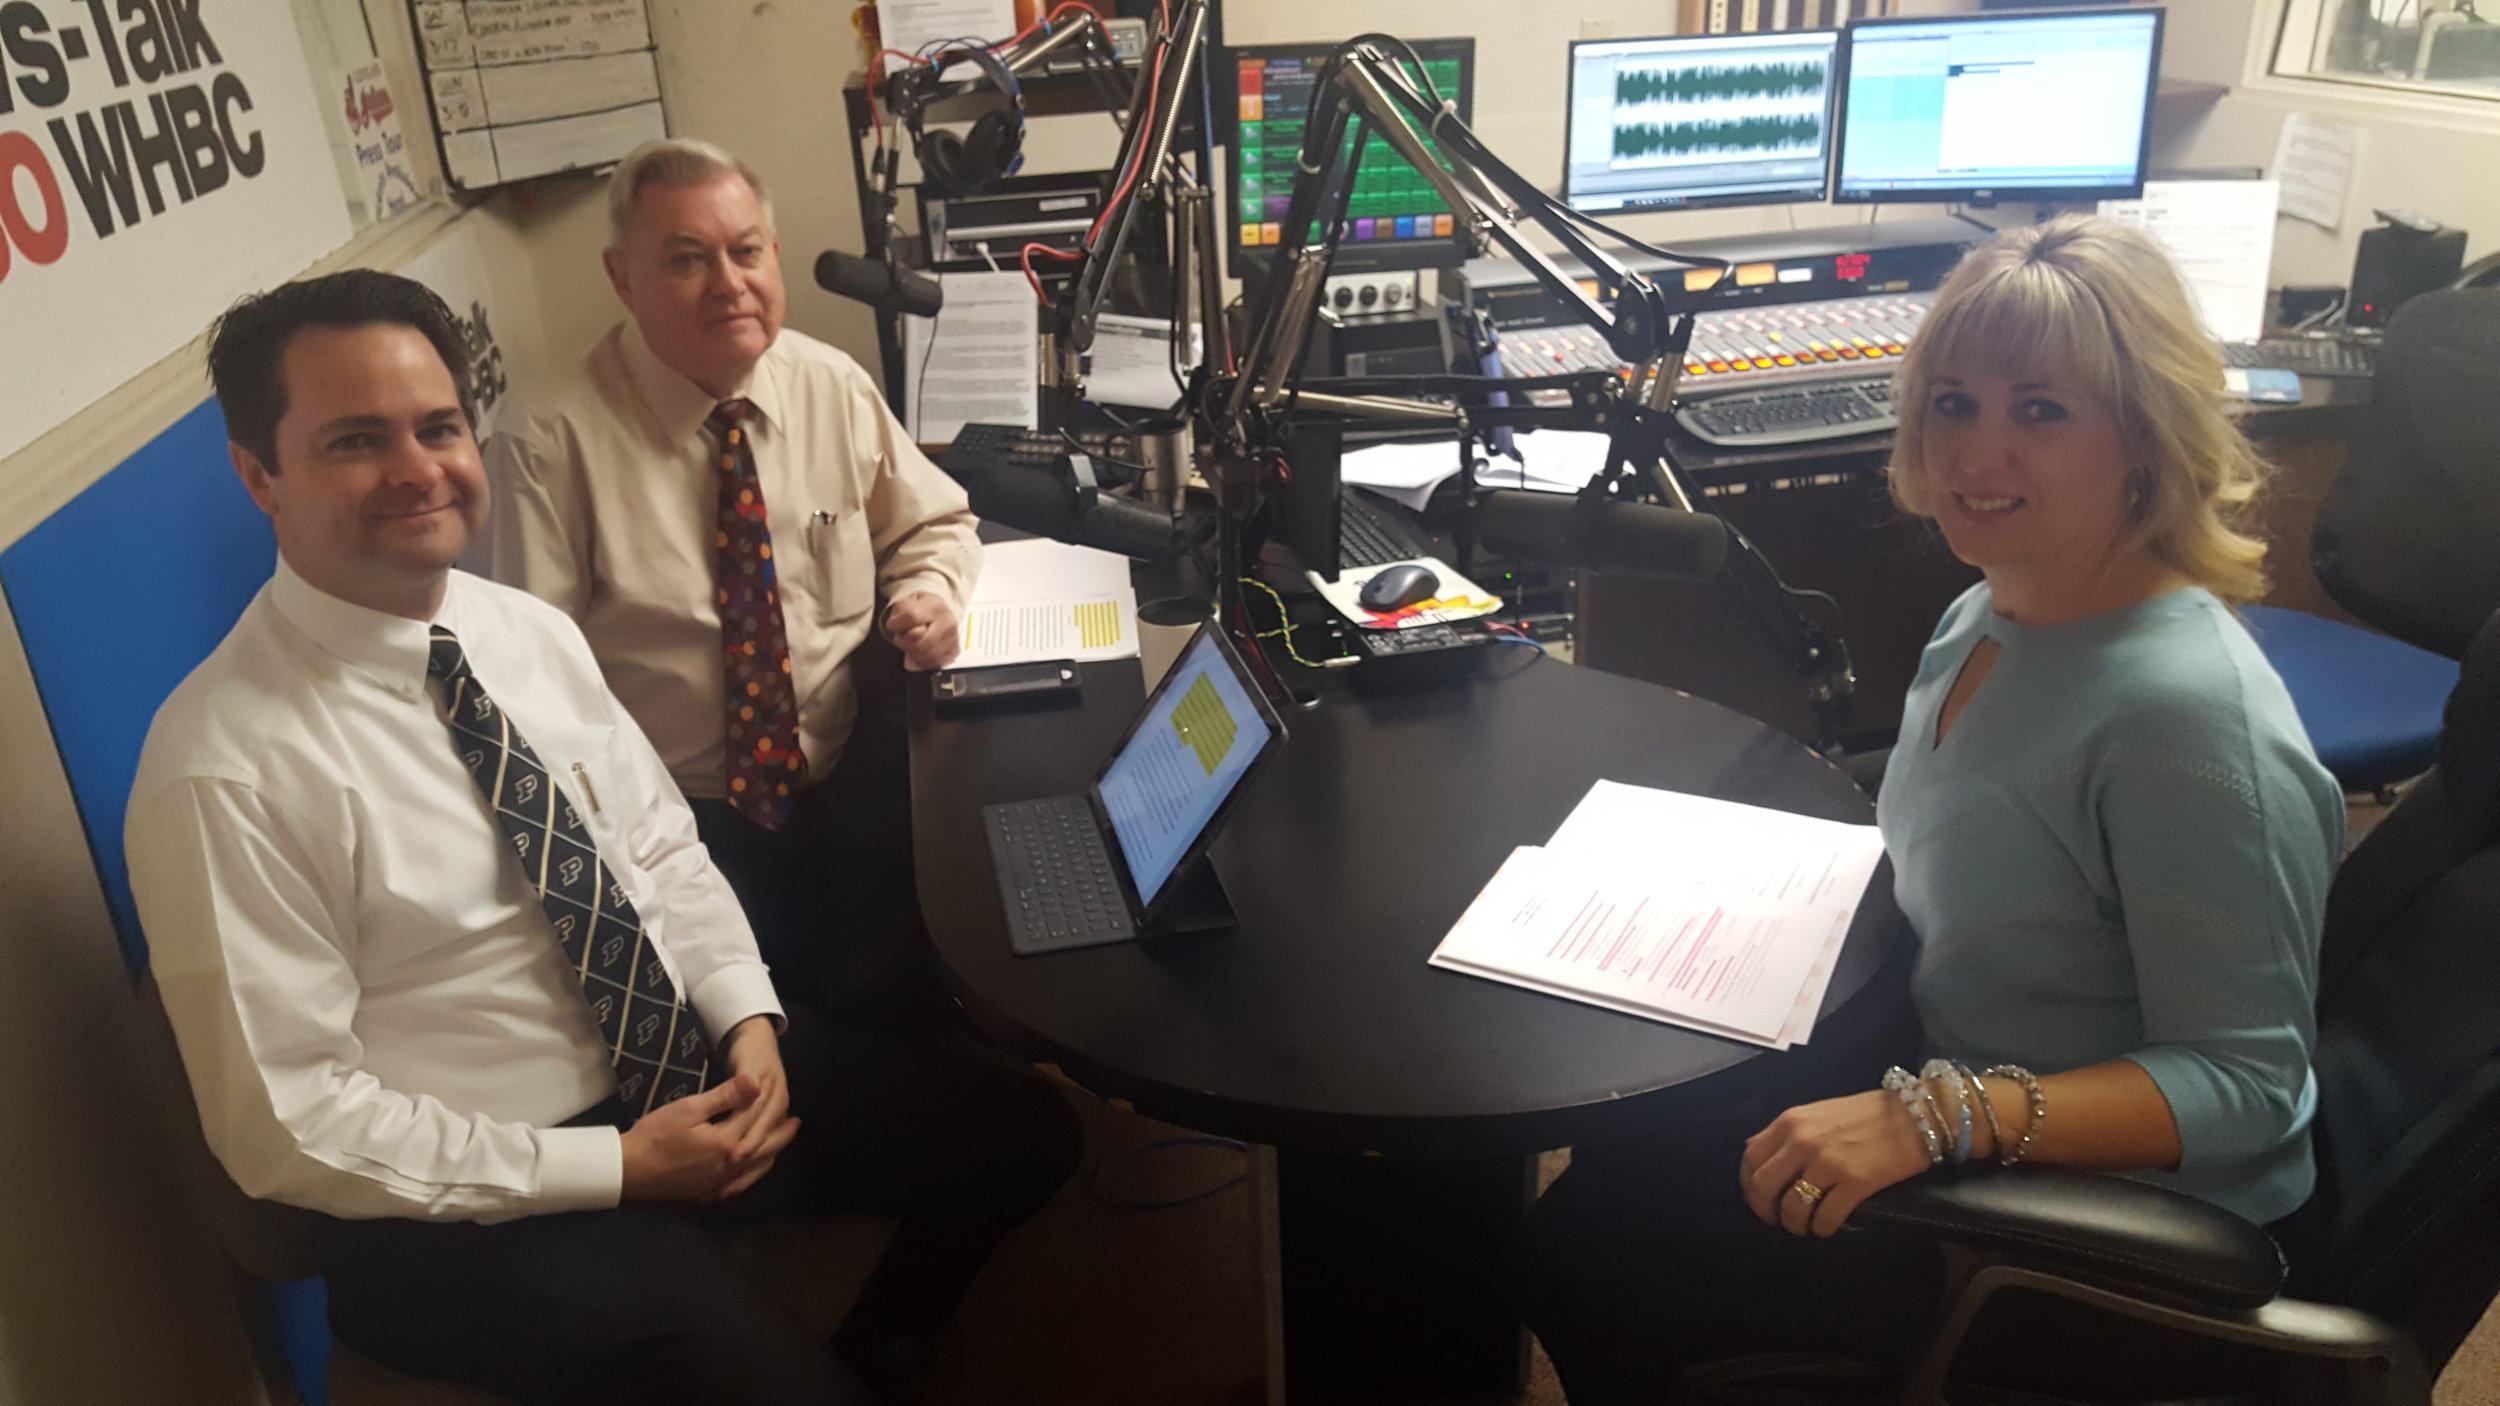 Hosts Brad White, R. Ph. and Paul White, R. Ph. talk with diabetes educator, Nicole Selinsky, Mercy Medical Center.